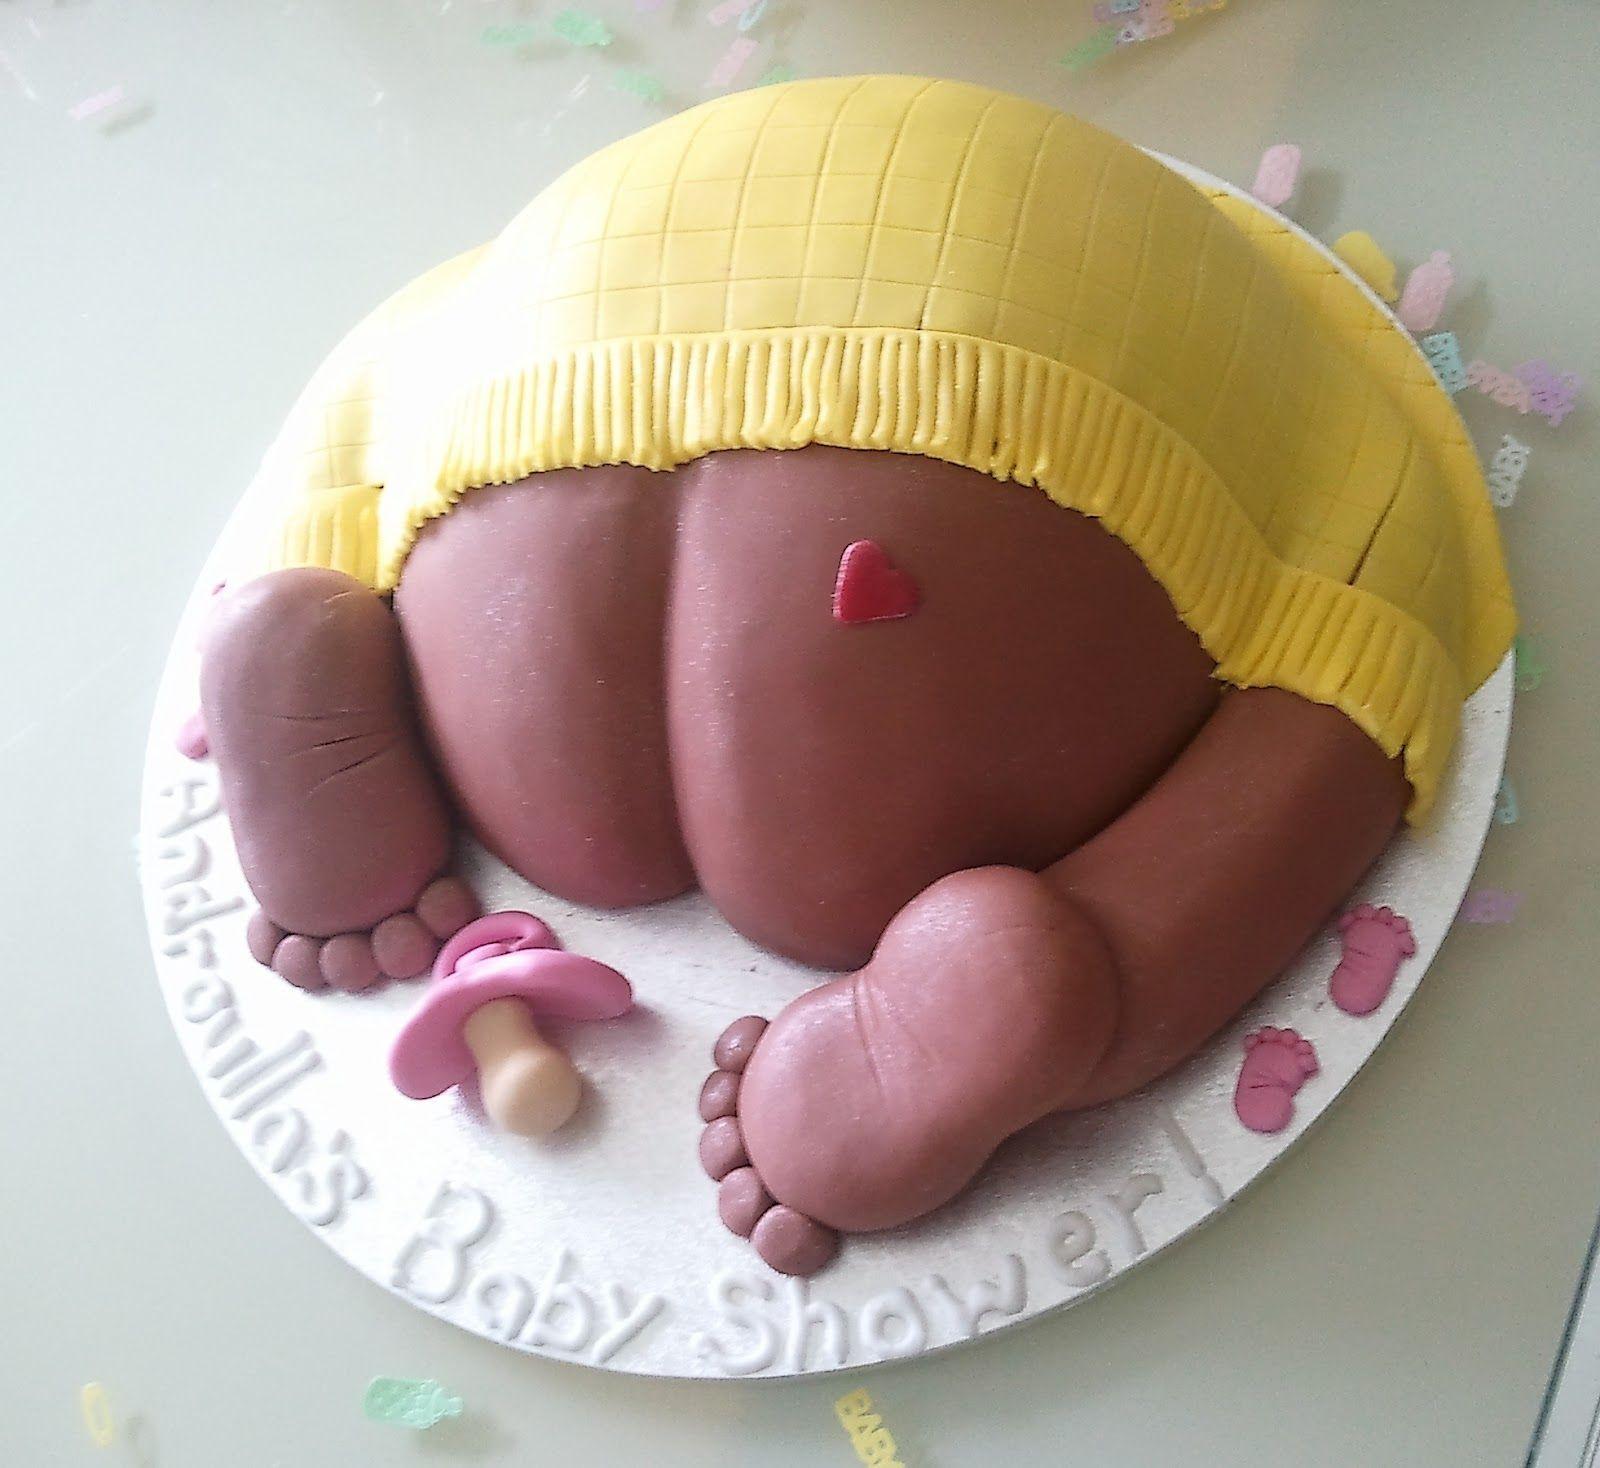 Gross Baby Shower Cakes - Awkward Baby Shower Cakes